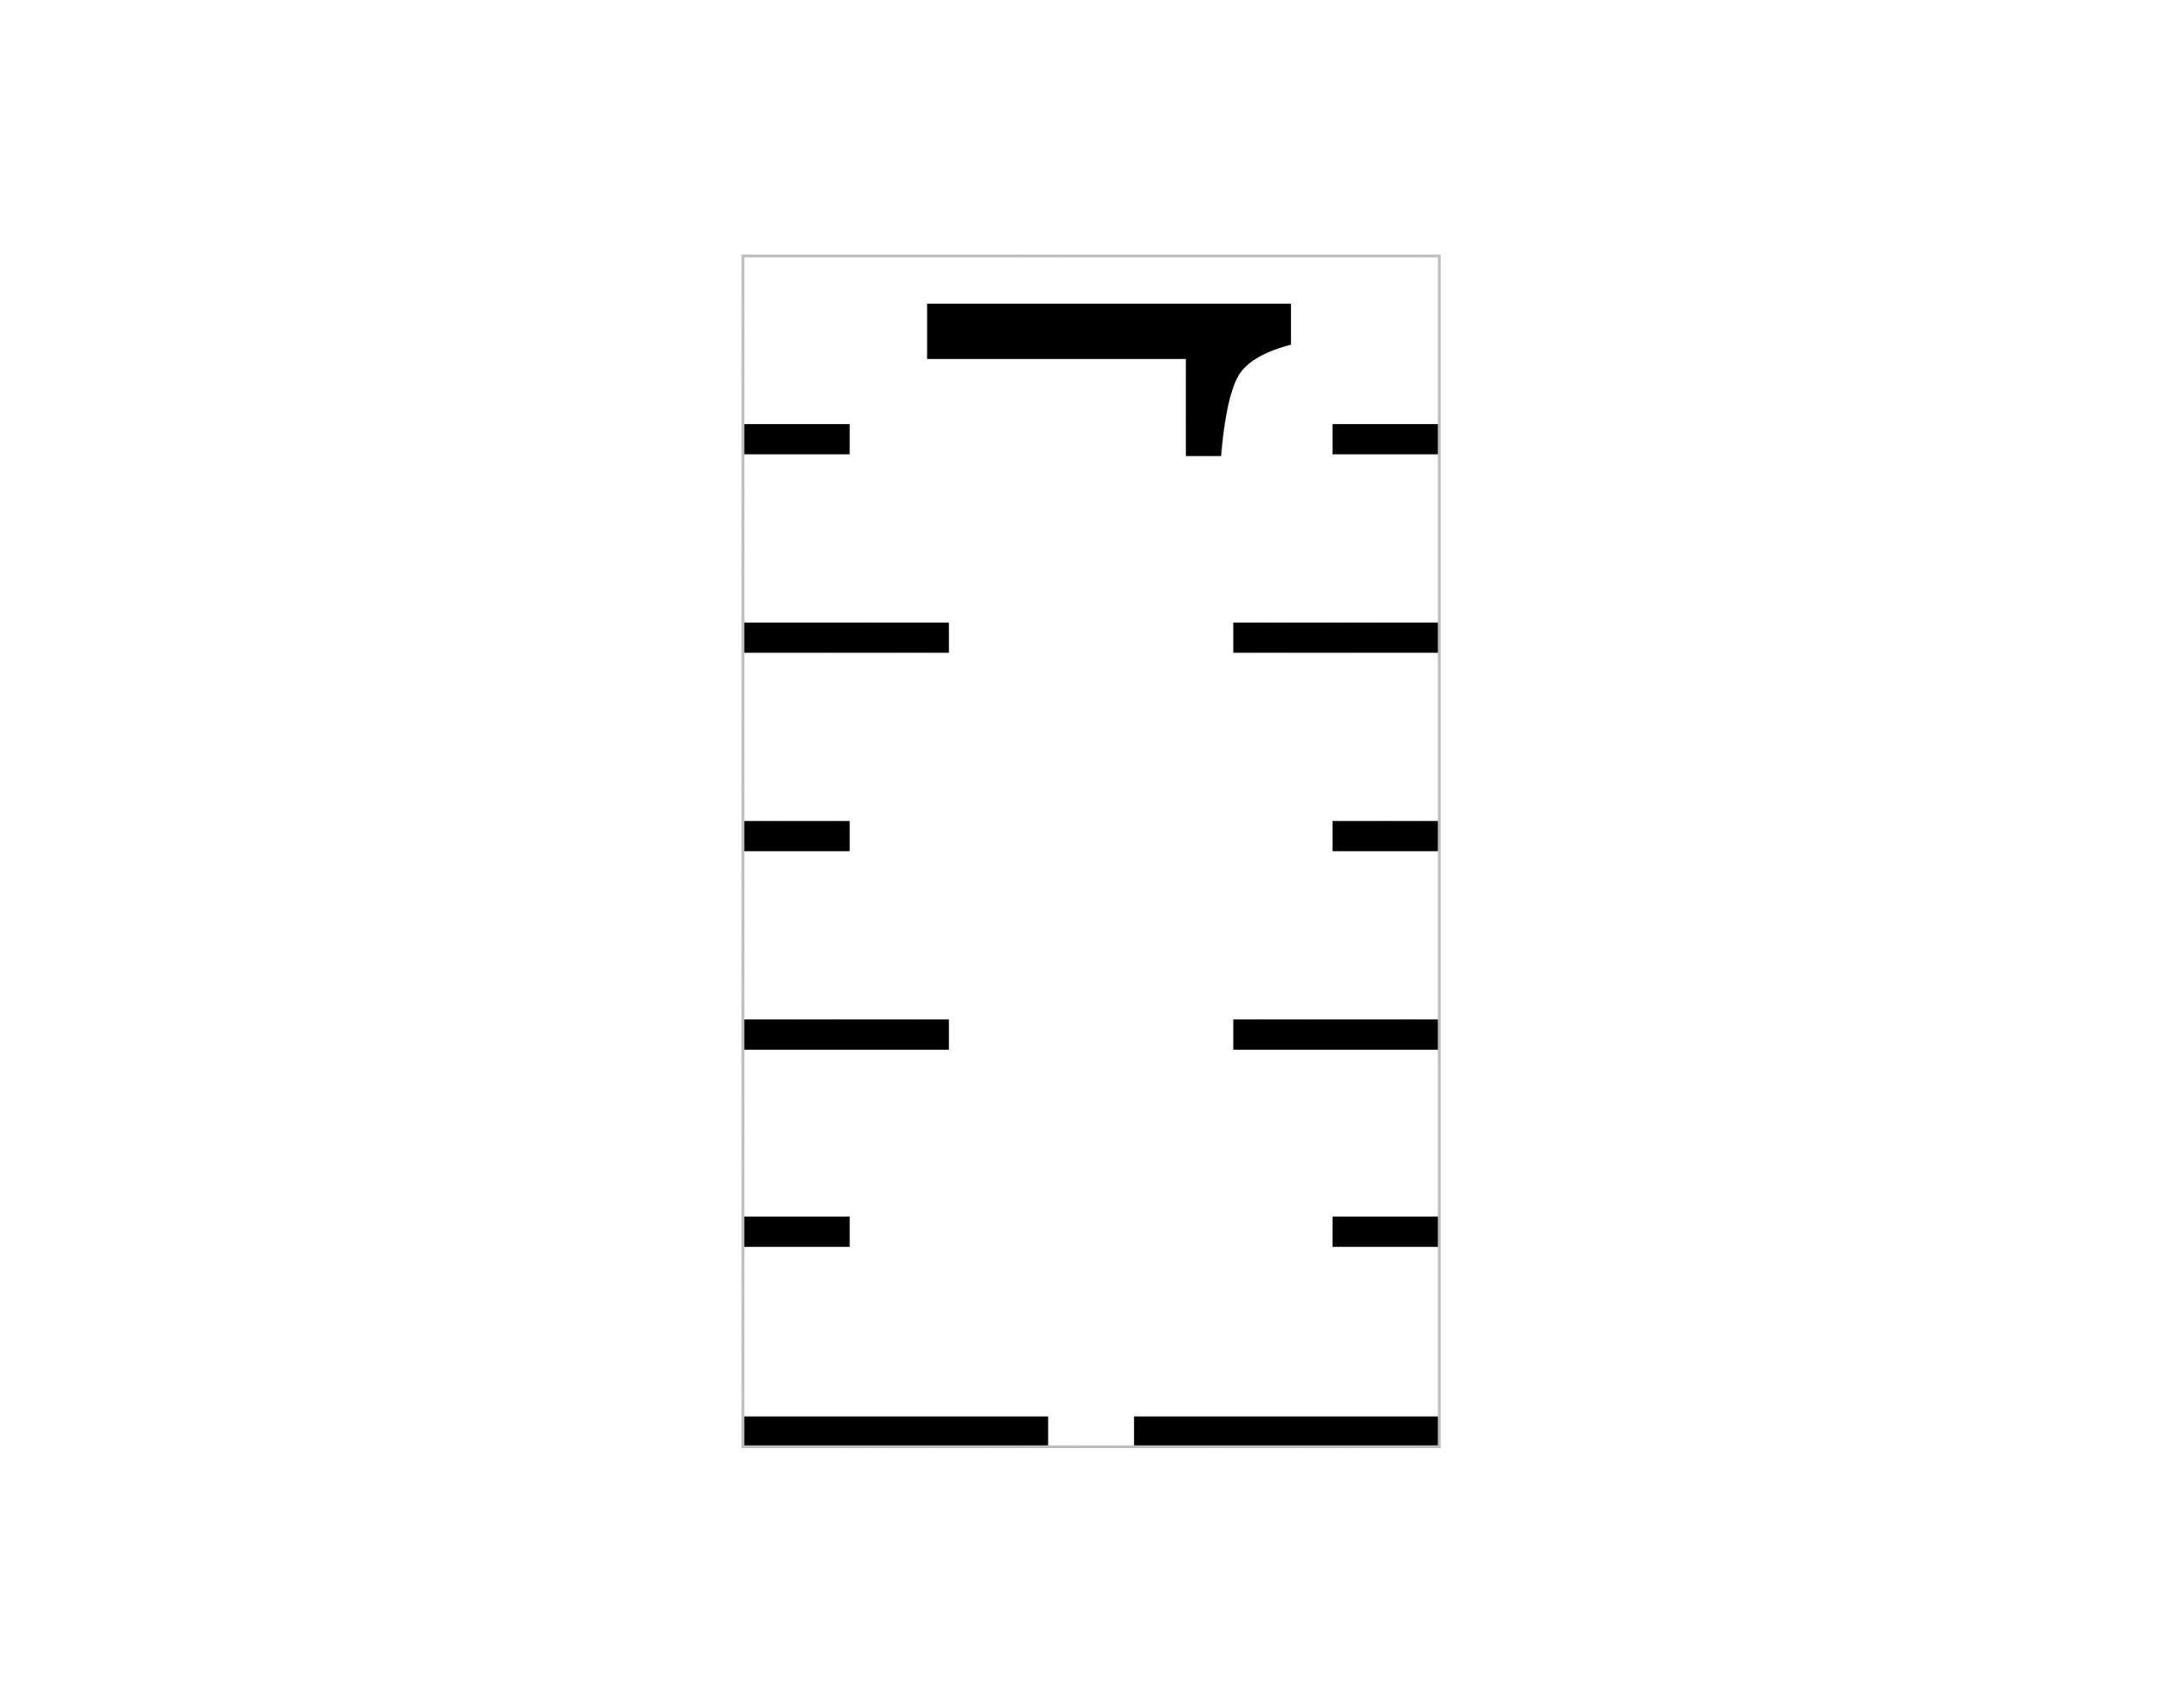 Easy Diy Ruler Growth Chart | Growth Chart Ruler, Height